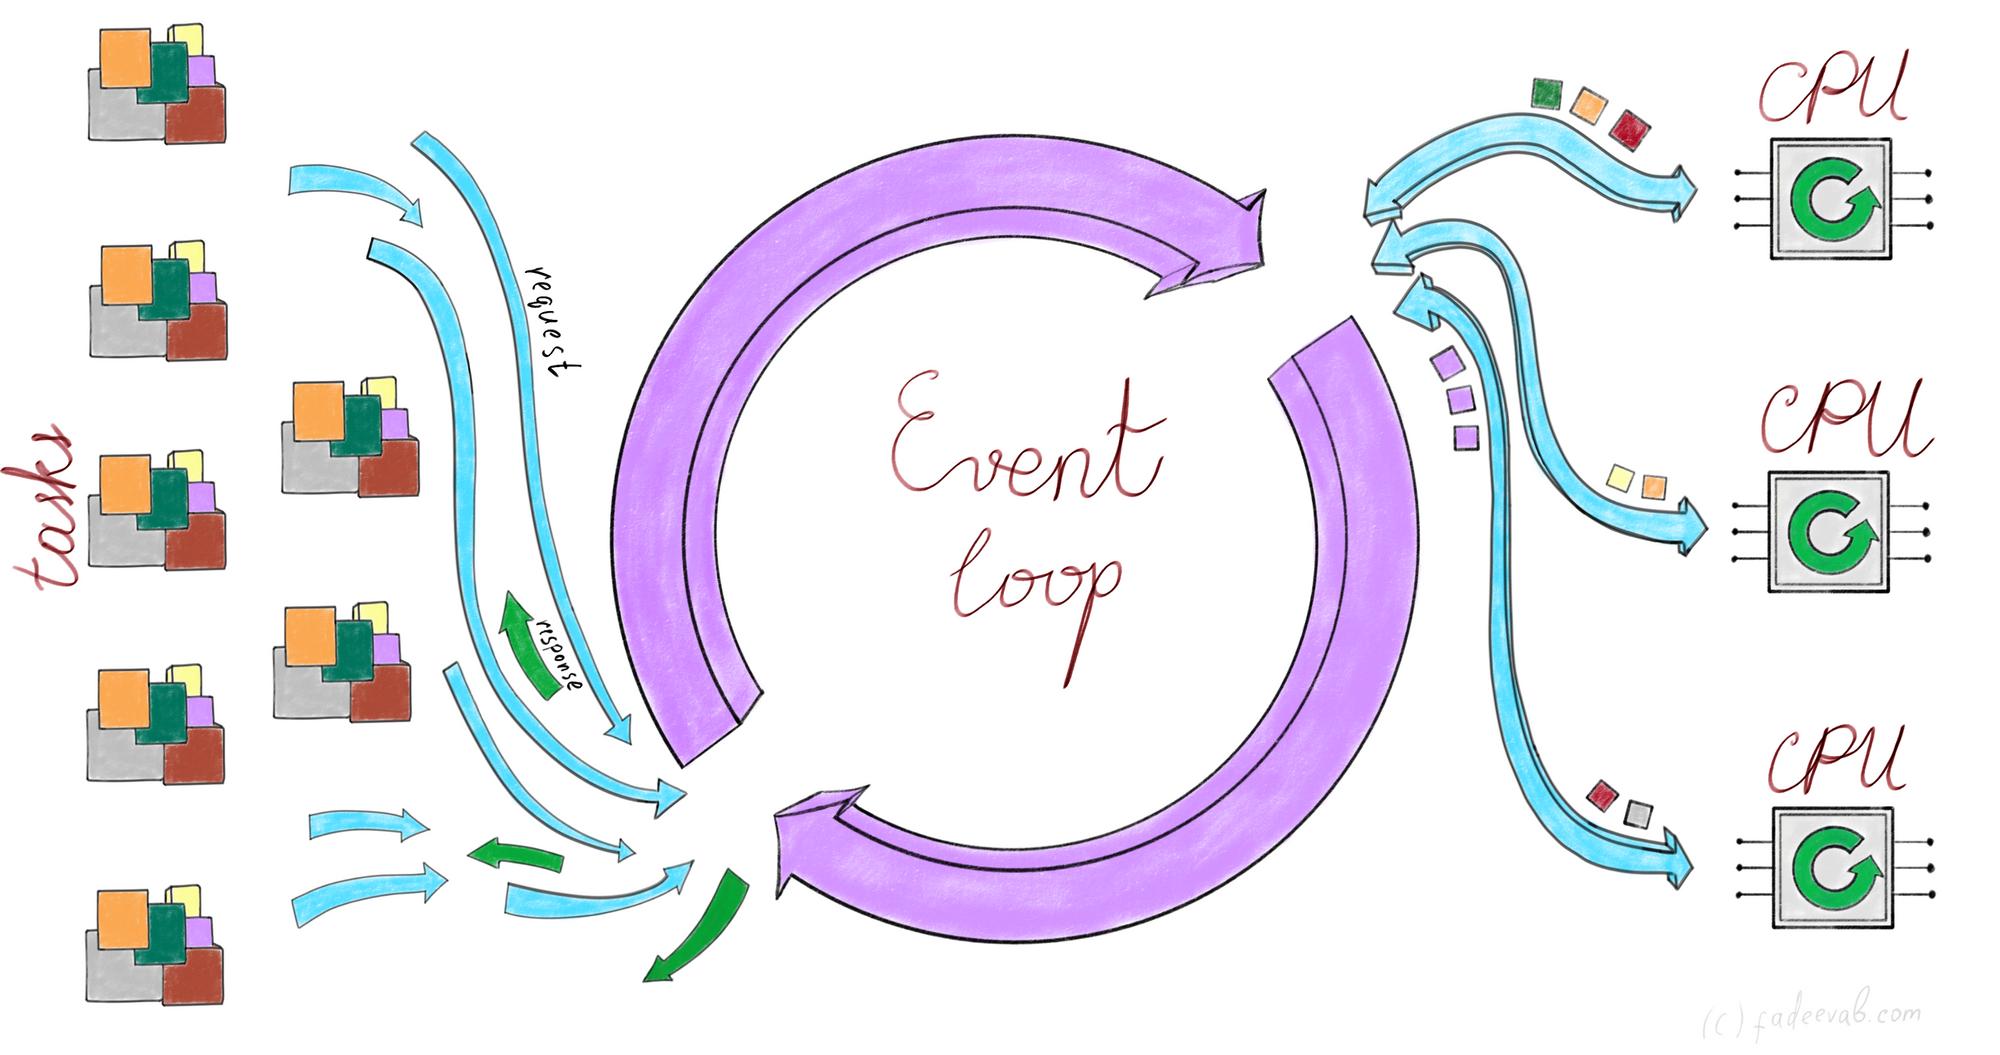 Event loop in cooperative multitasking